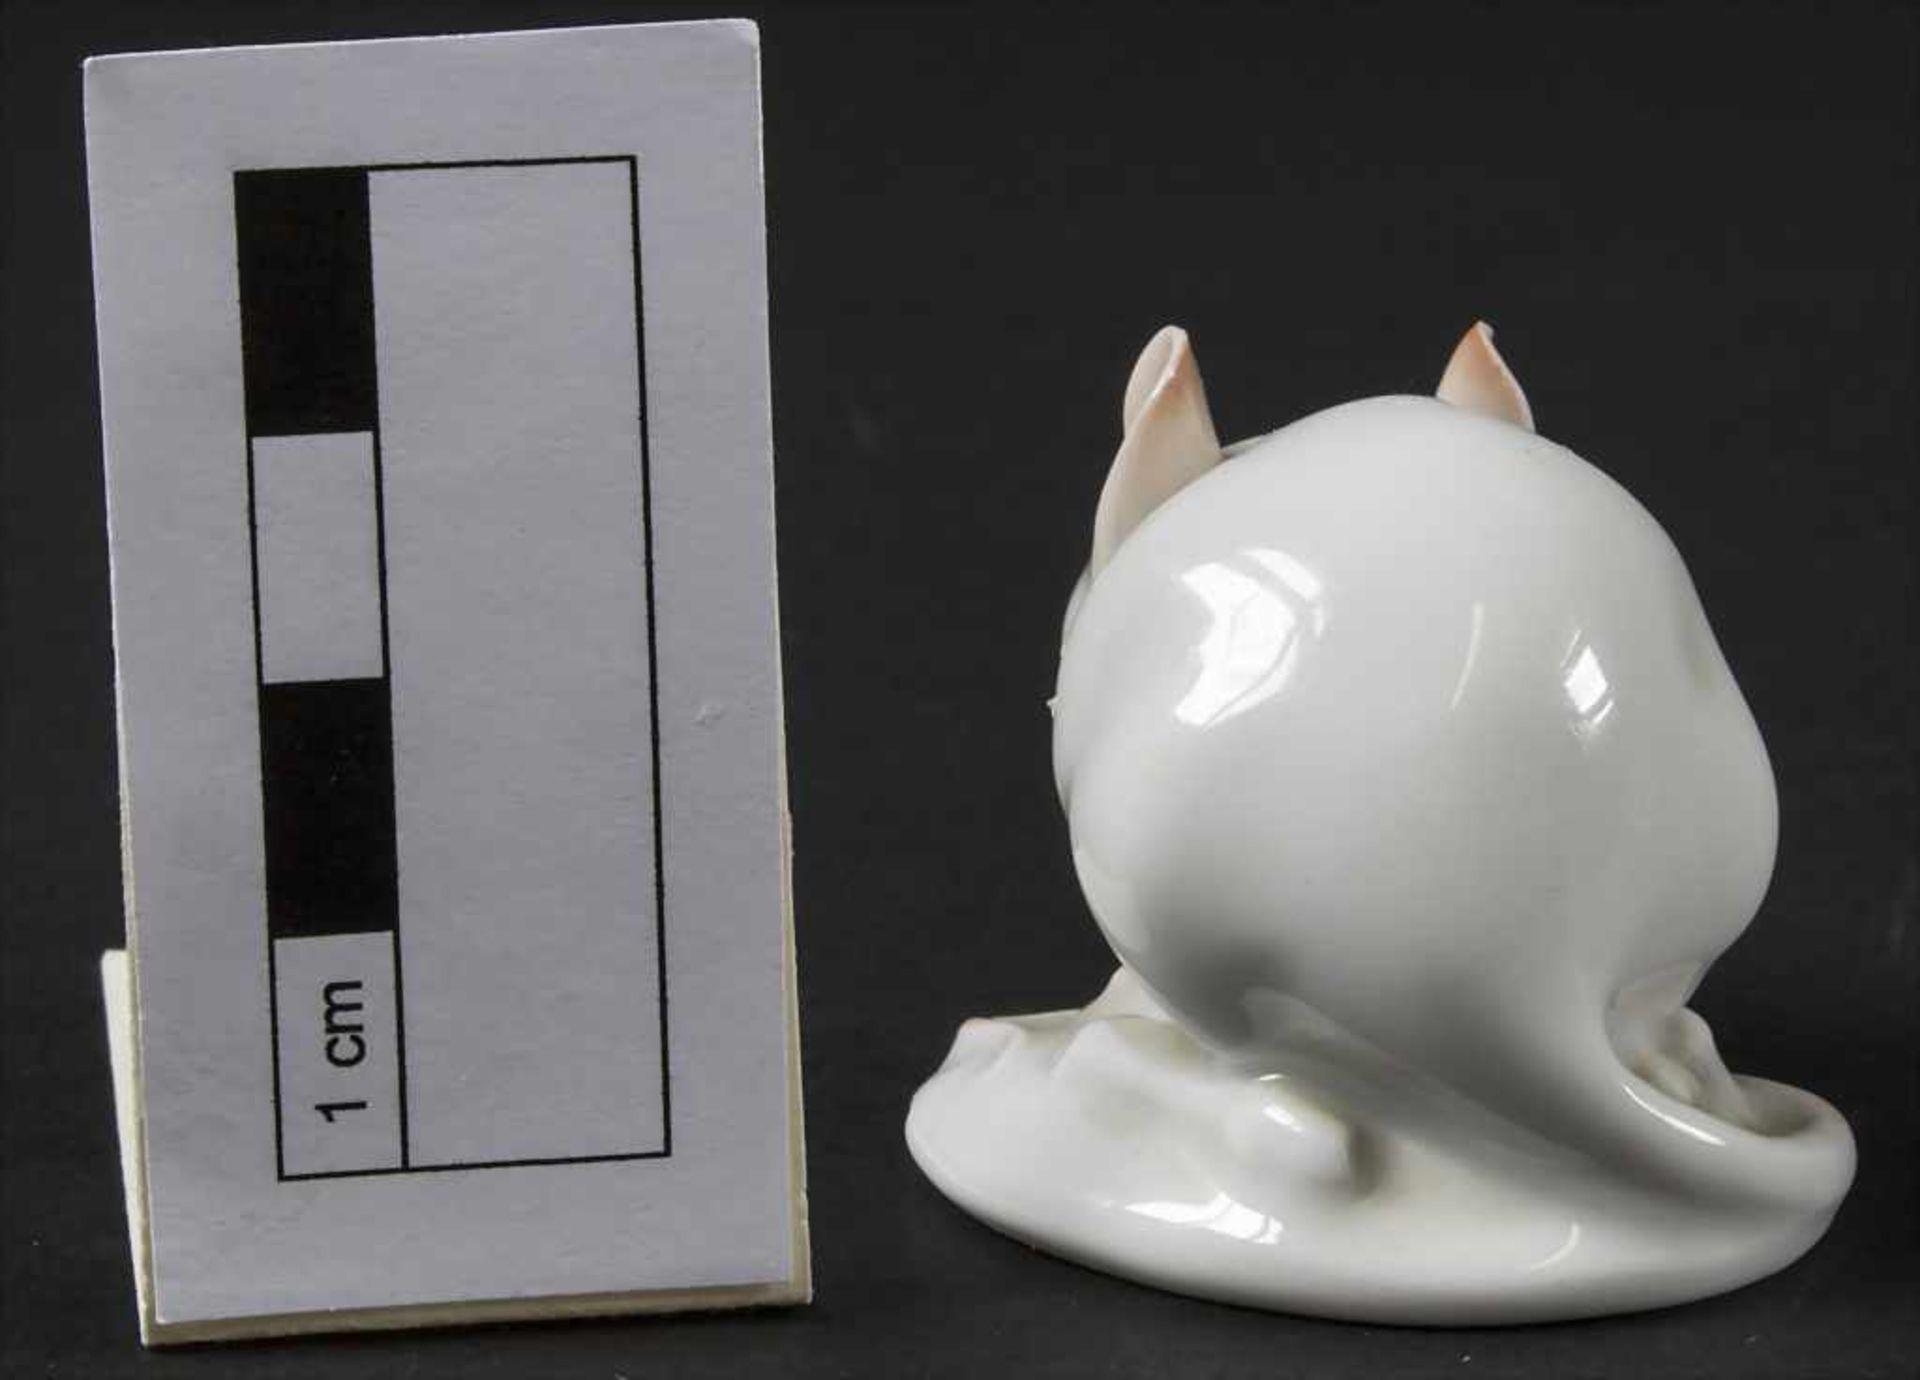 Maus / A mouse, Rosenthal, Selb, um 1930 - Bild 3 aus 3